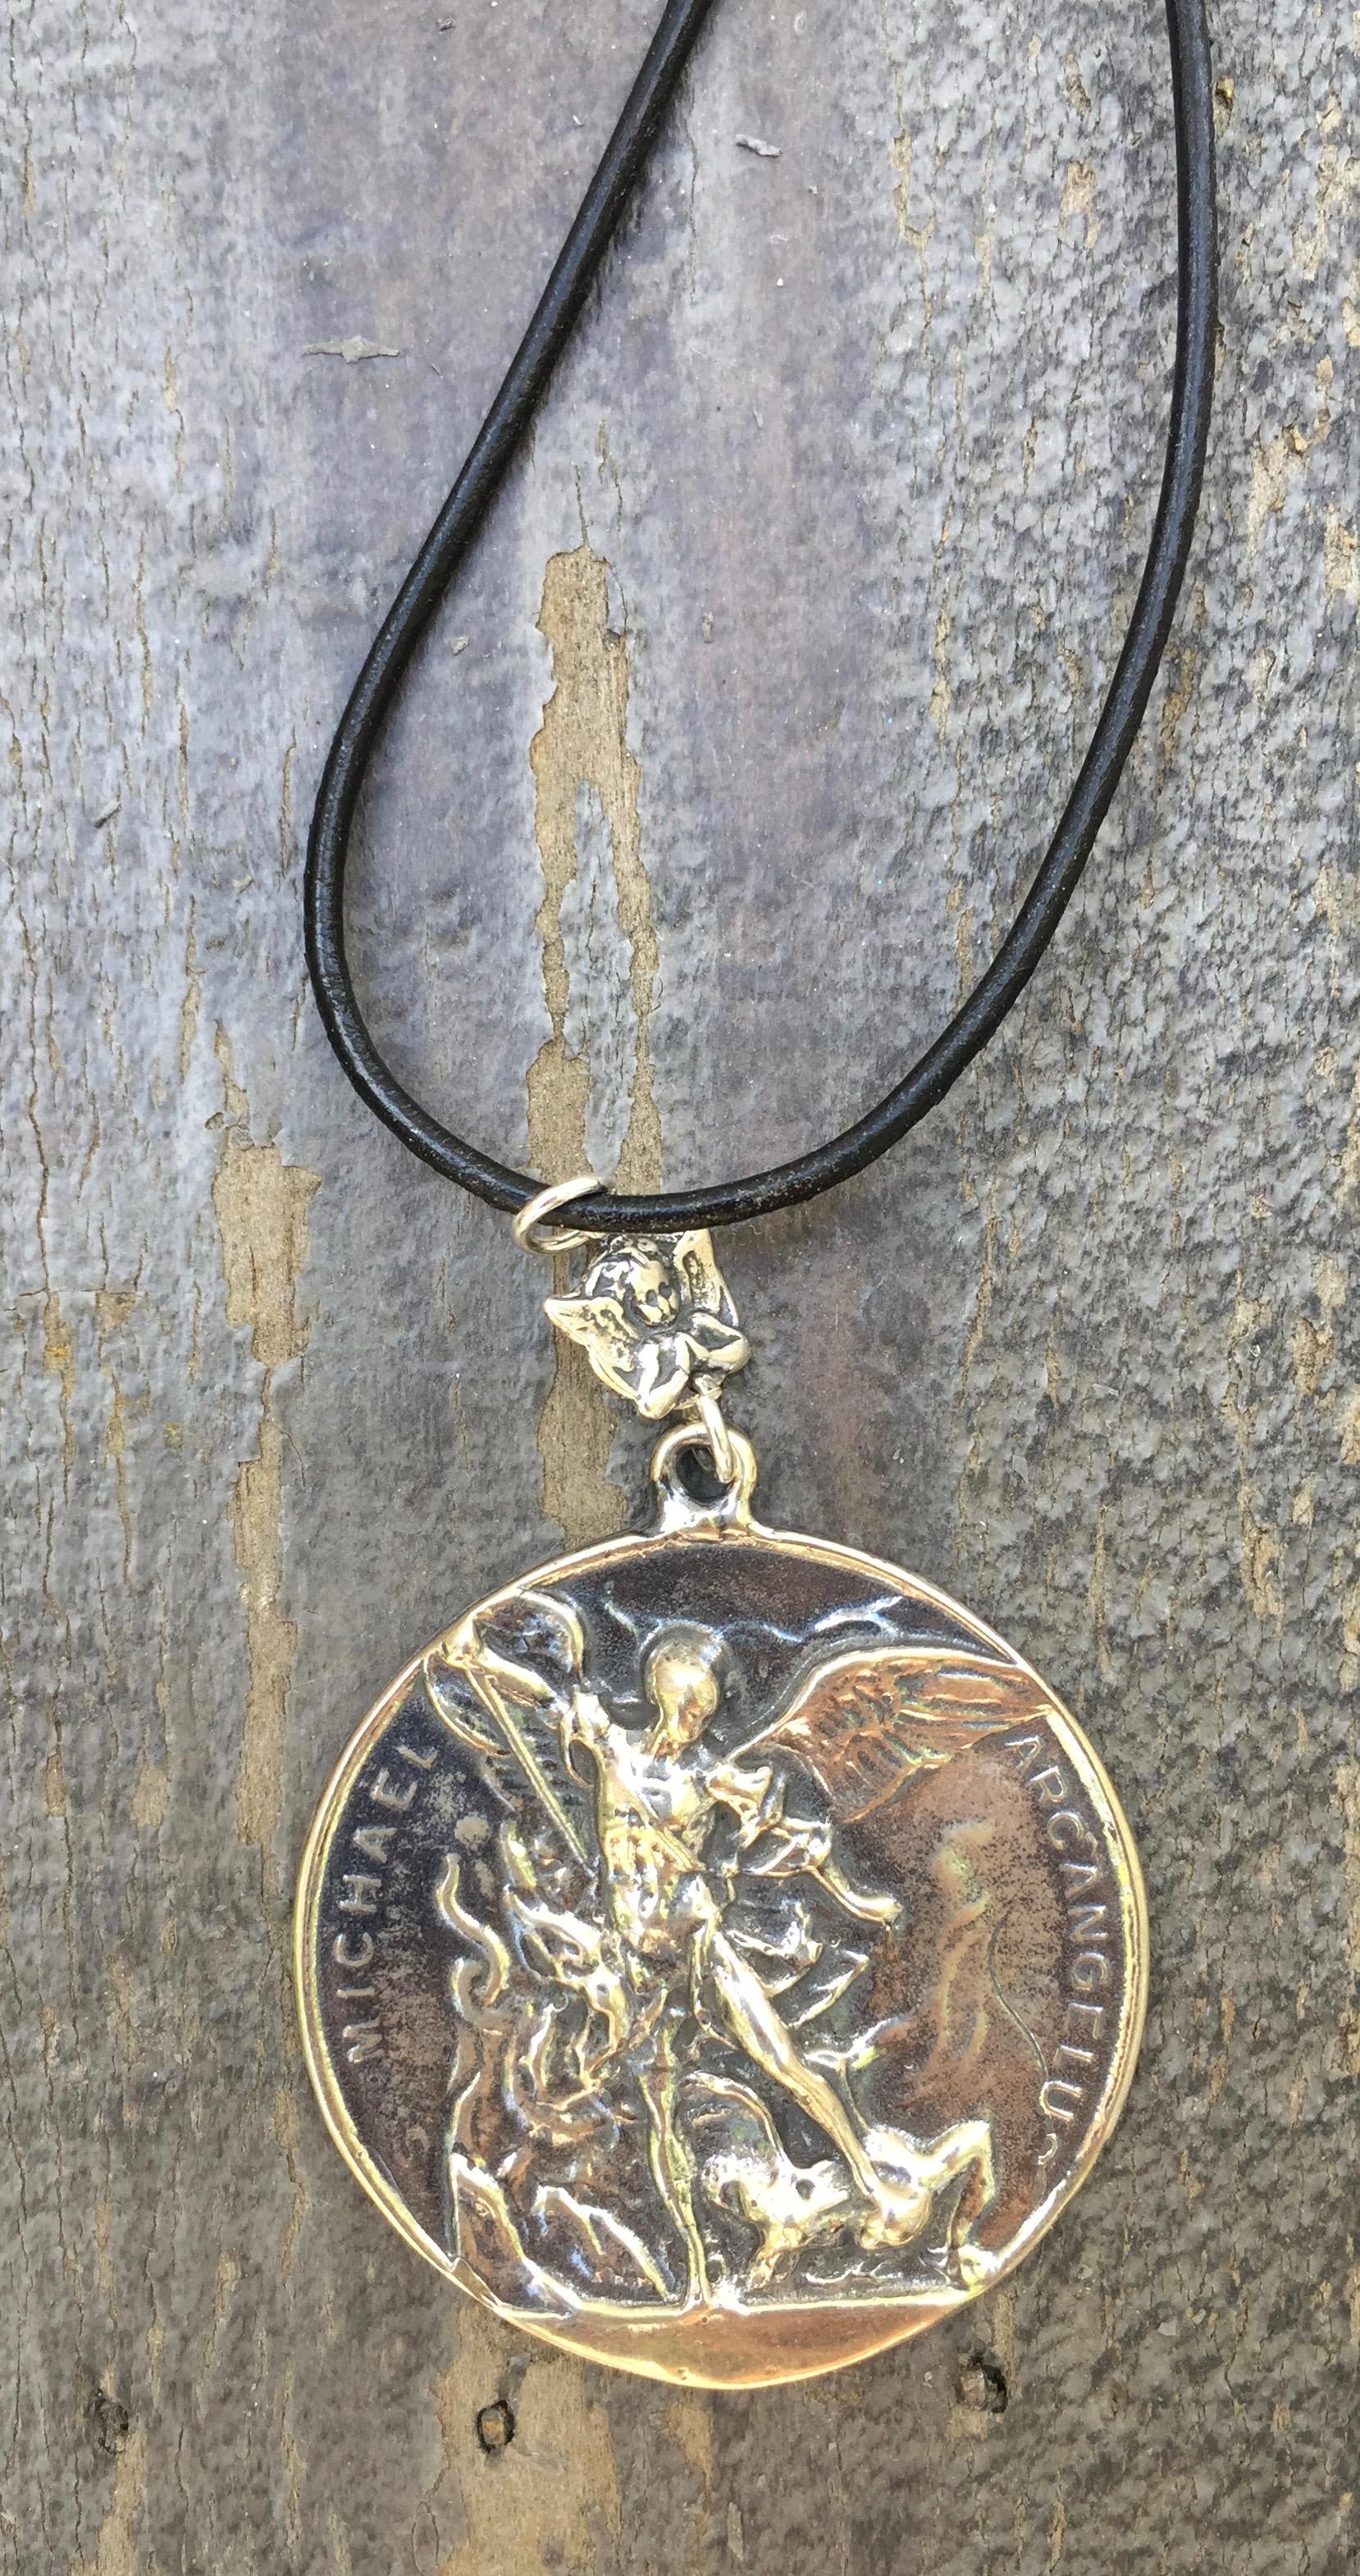 Necklace Of Faith - St. Michael the Archangel